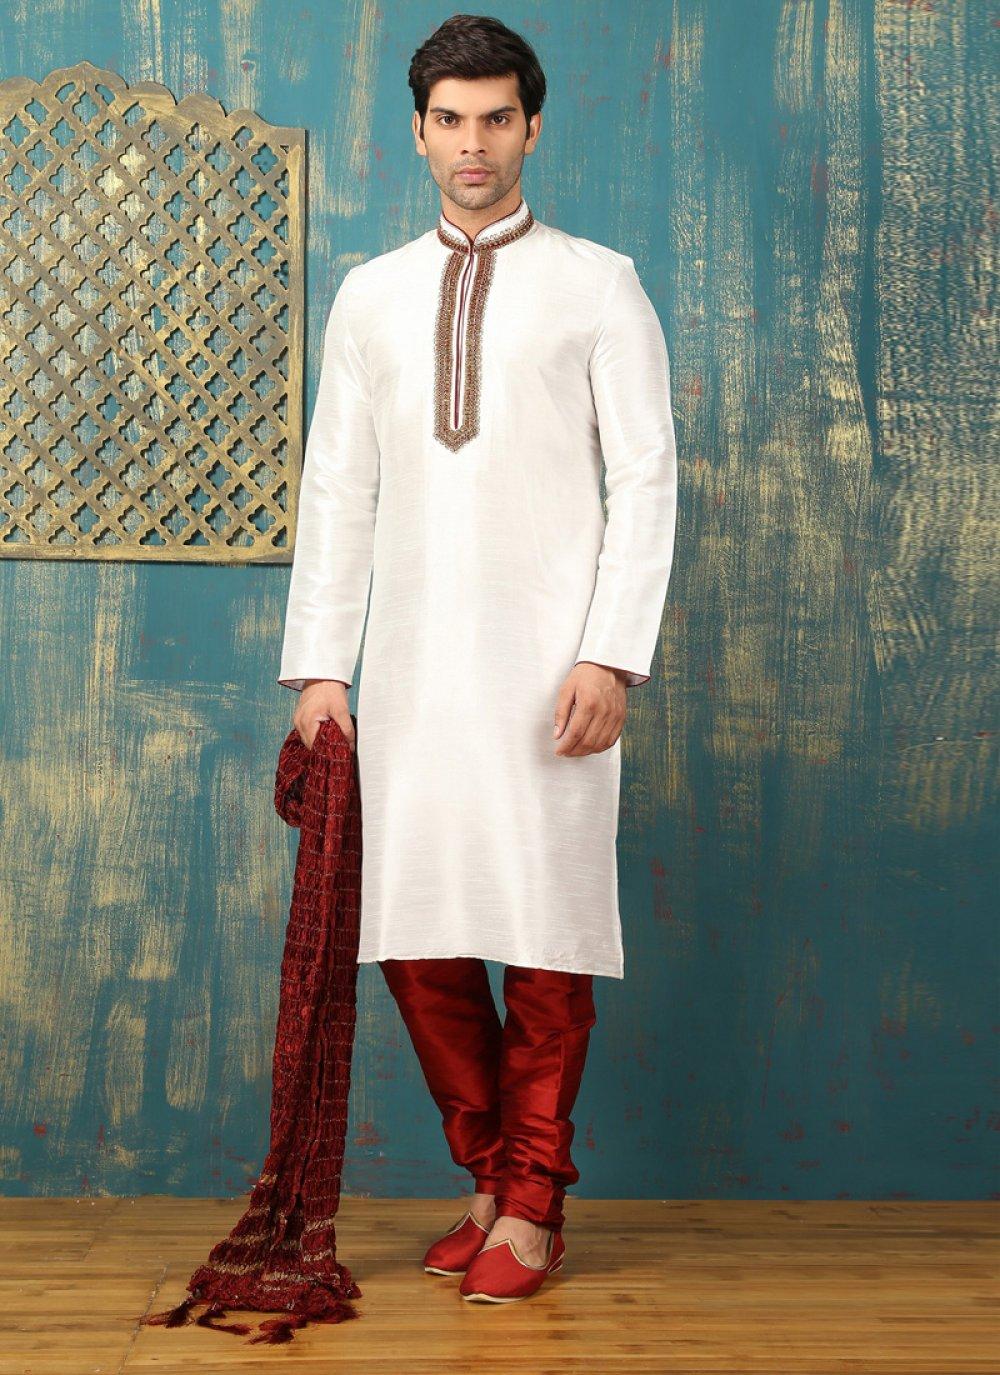 Off White Dupion Silk Kurta Pyjama with Embroidered